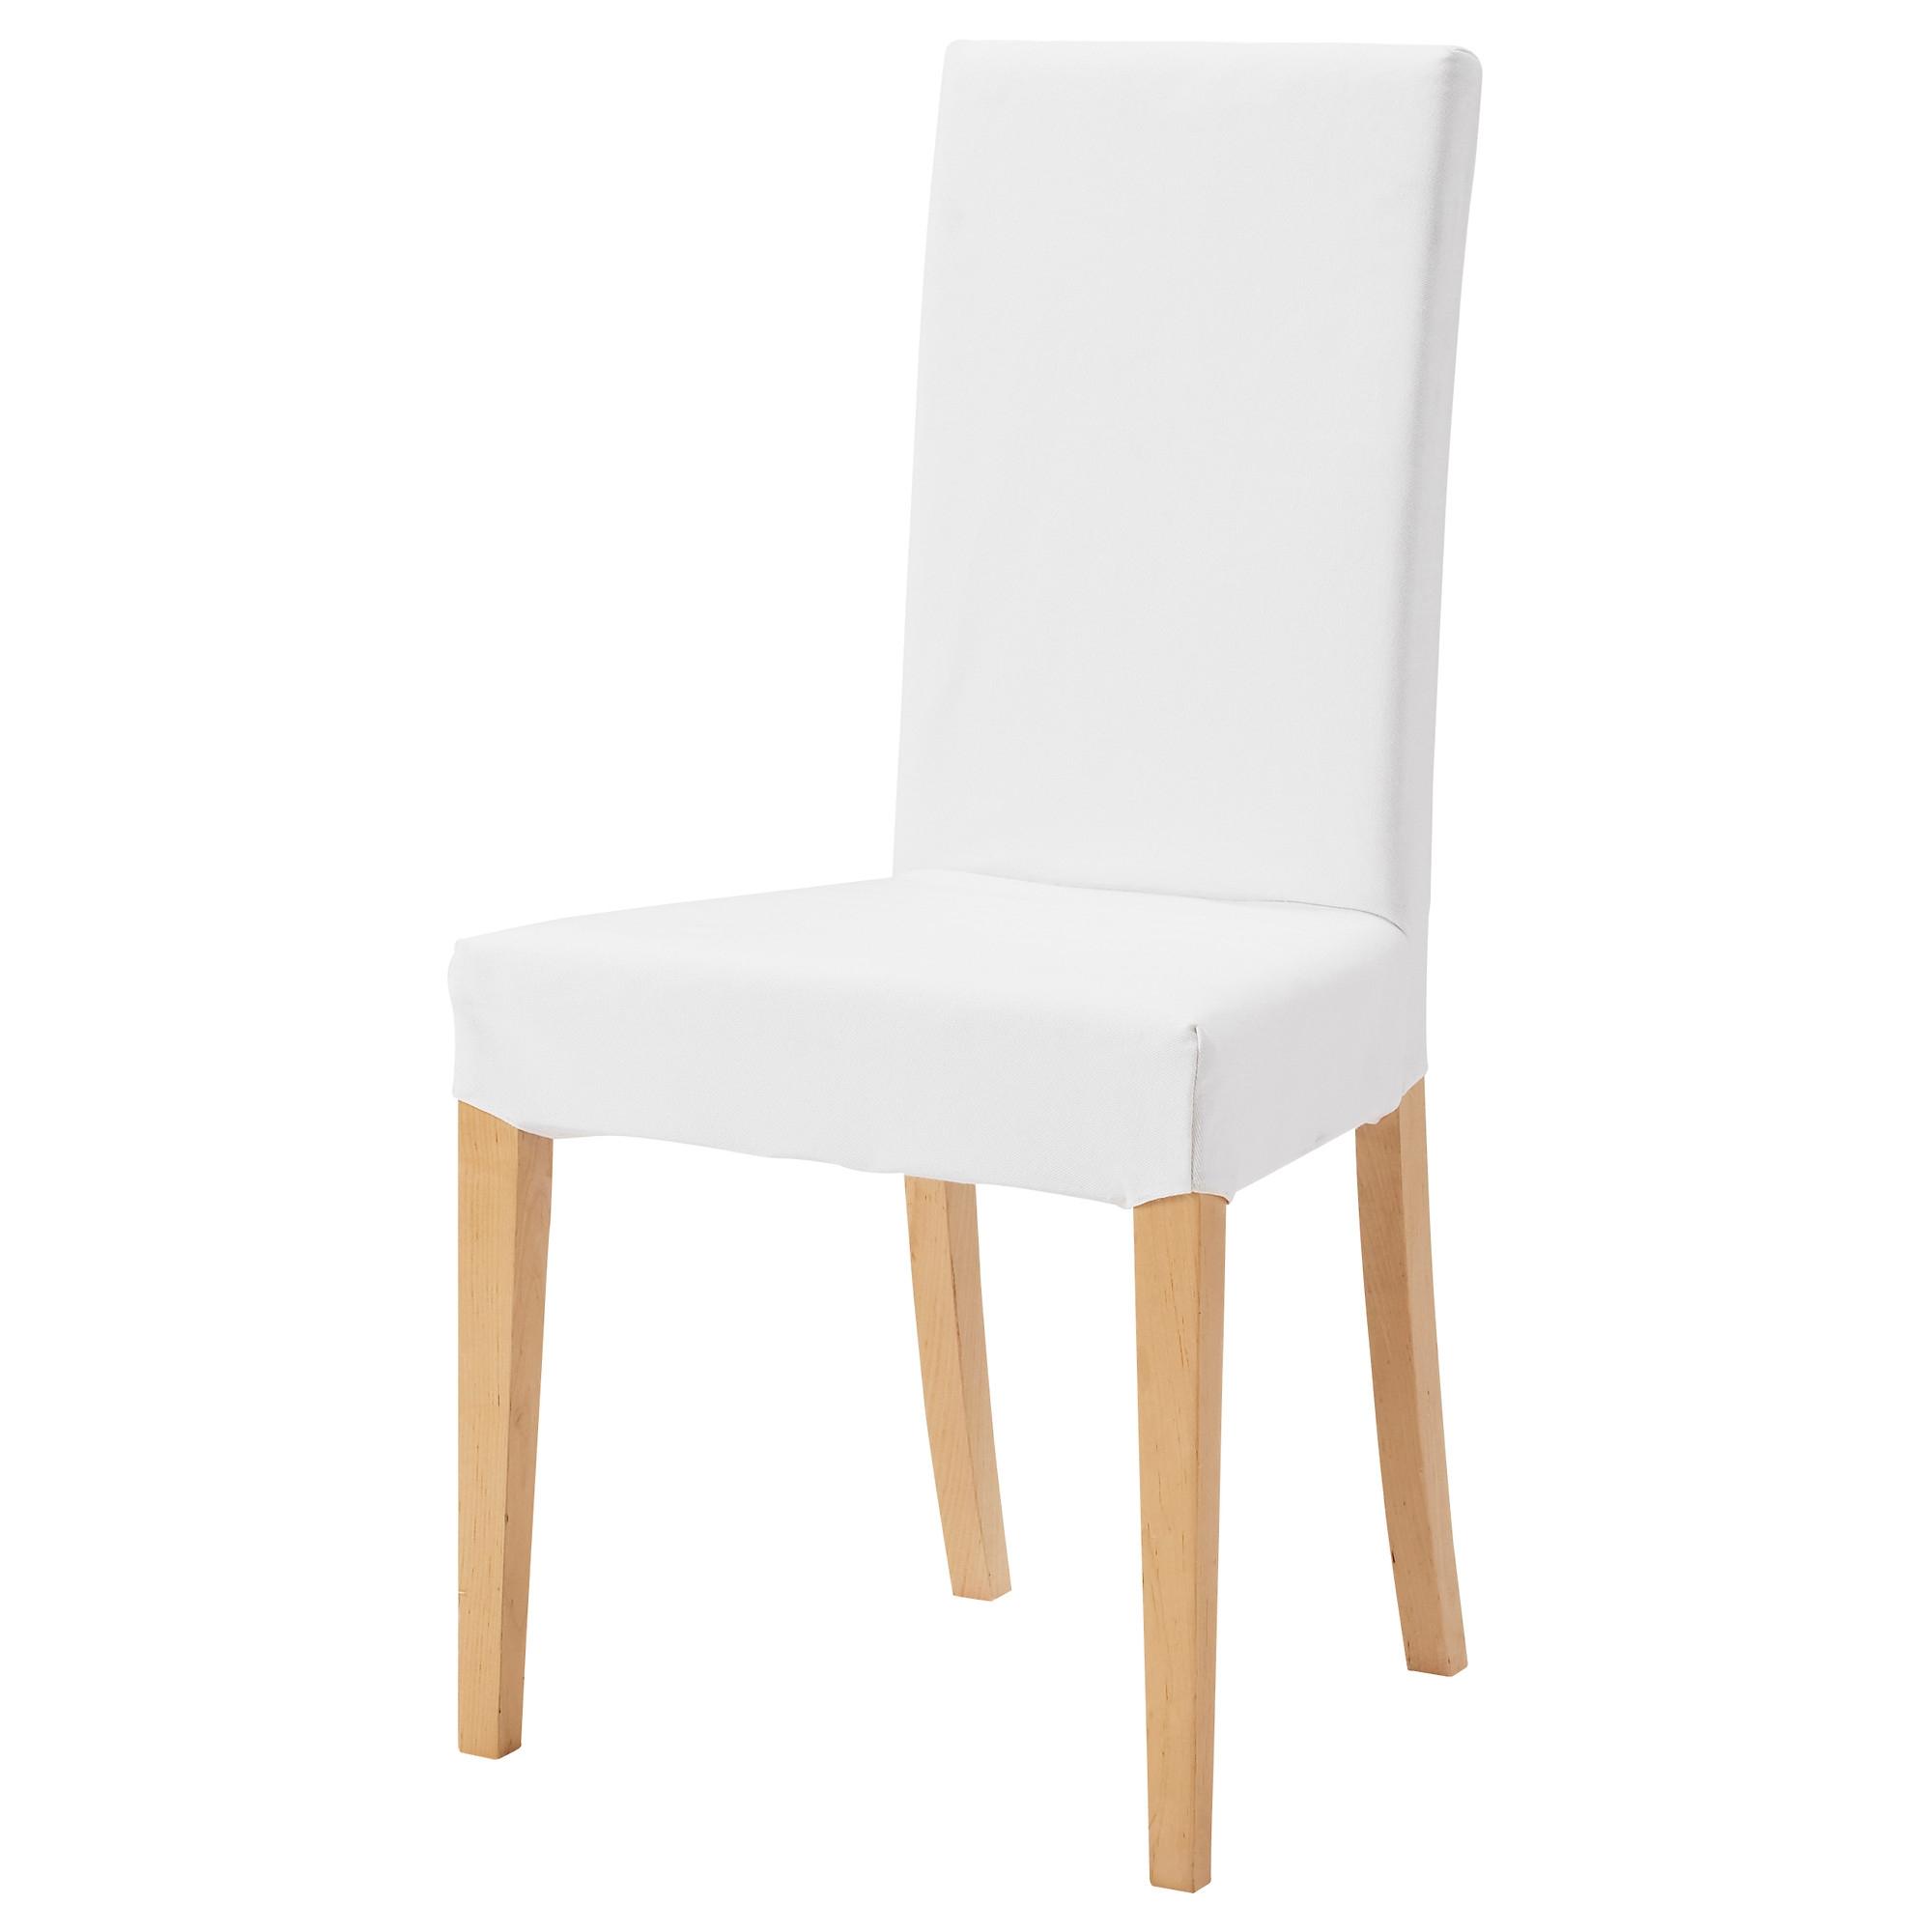 Ikea Oferta Sillas Comedor De Oferta 5AL3j4R